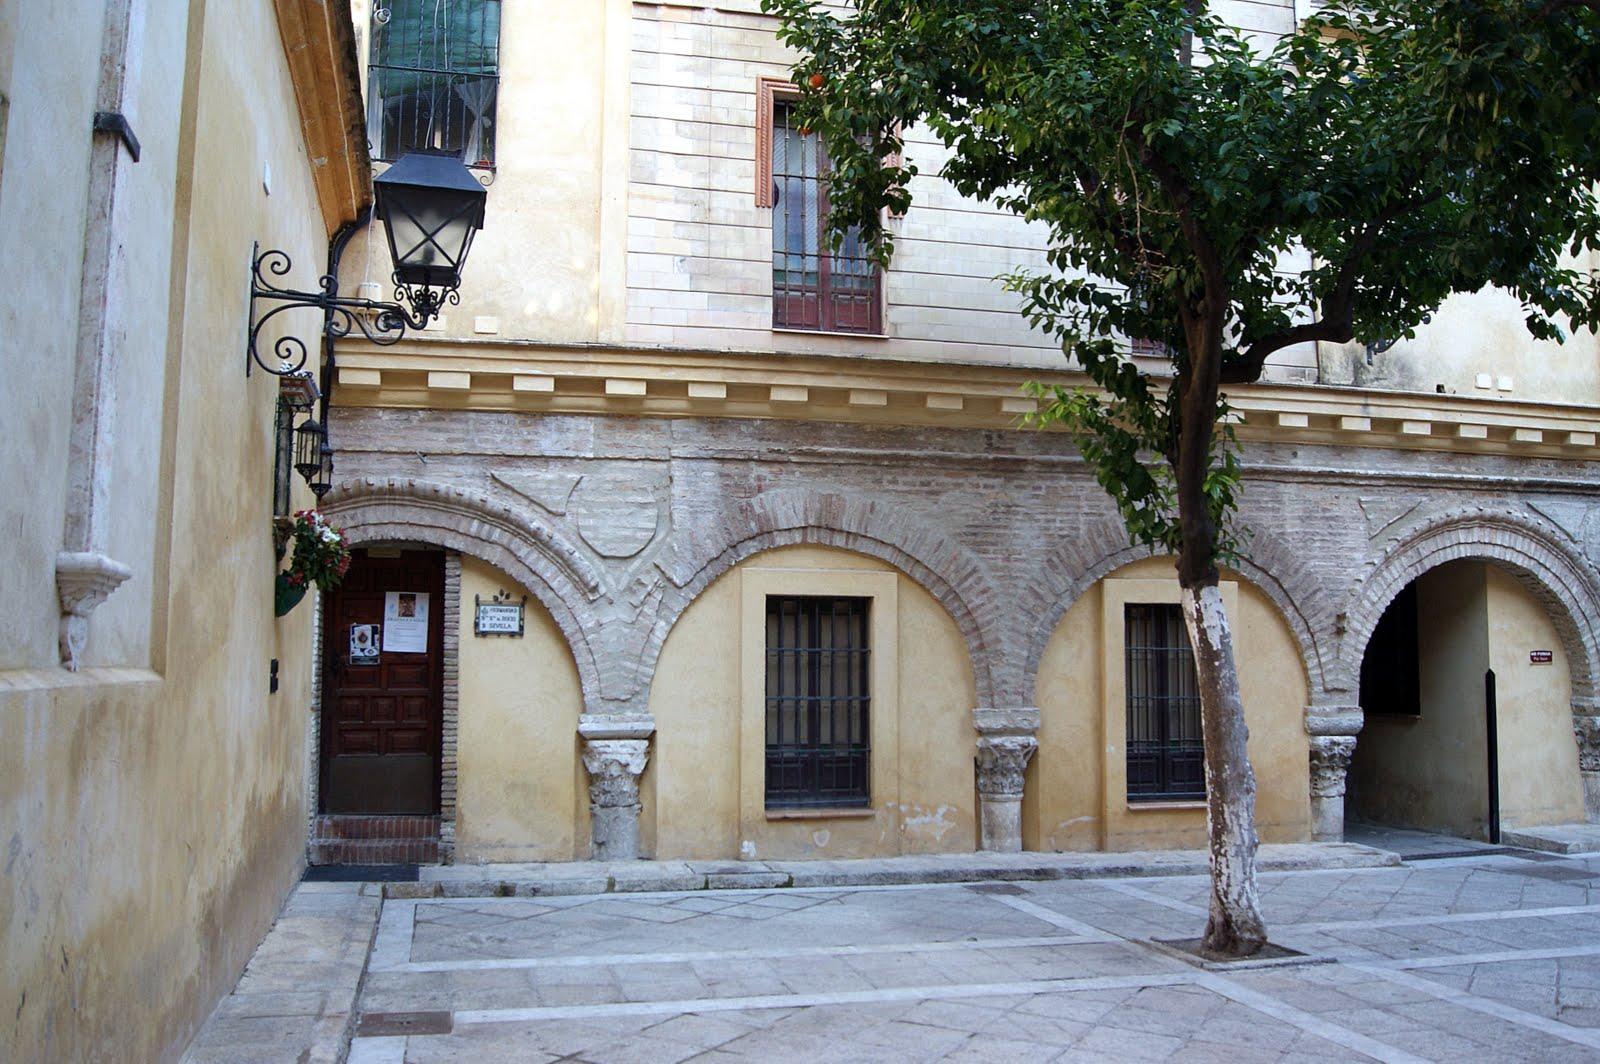 Leyendas de Sevilla: Iglesia Colegial del Divino Salvador -I ...